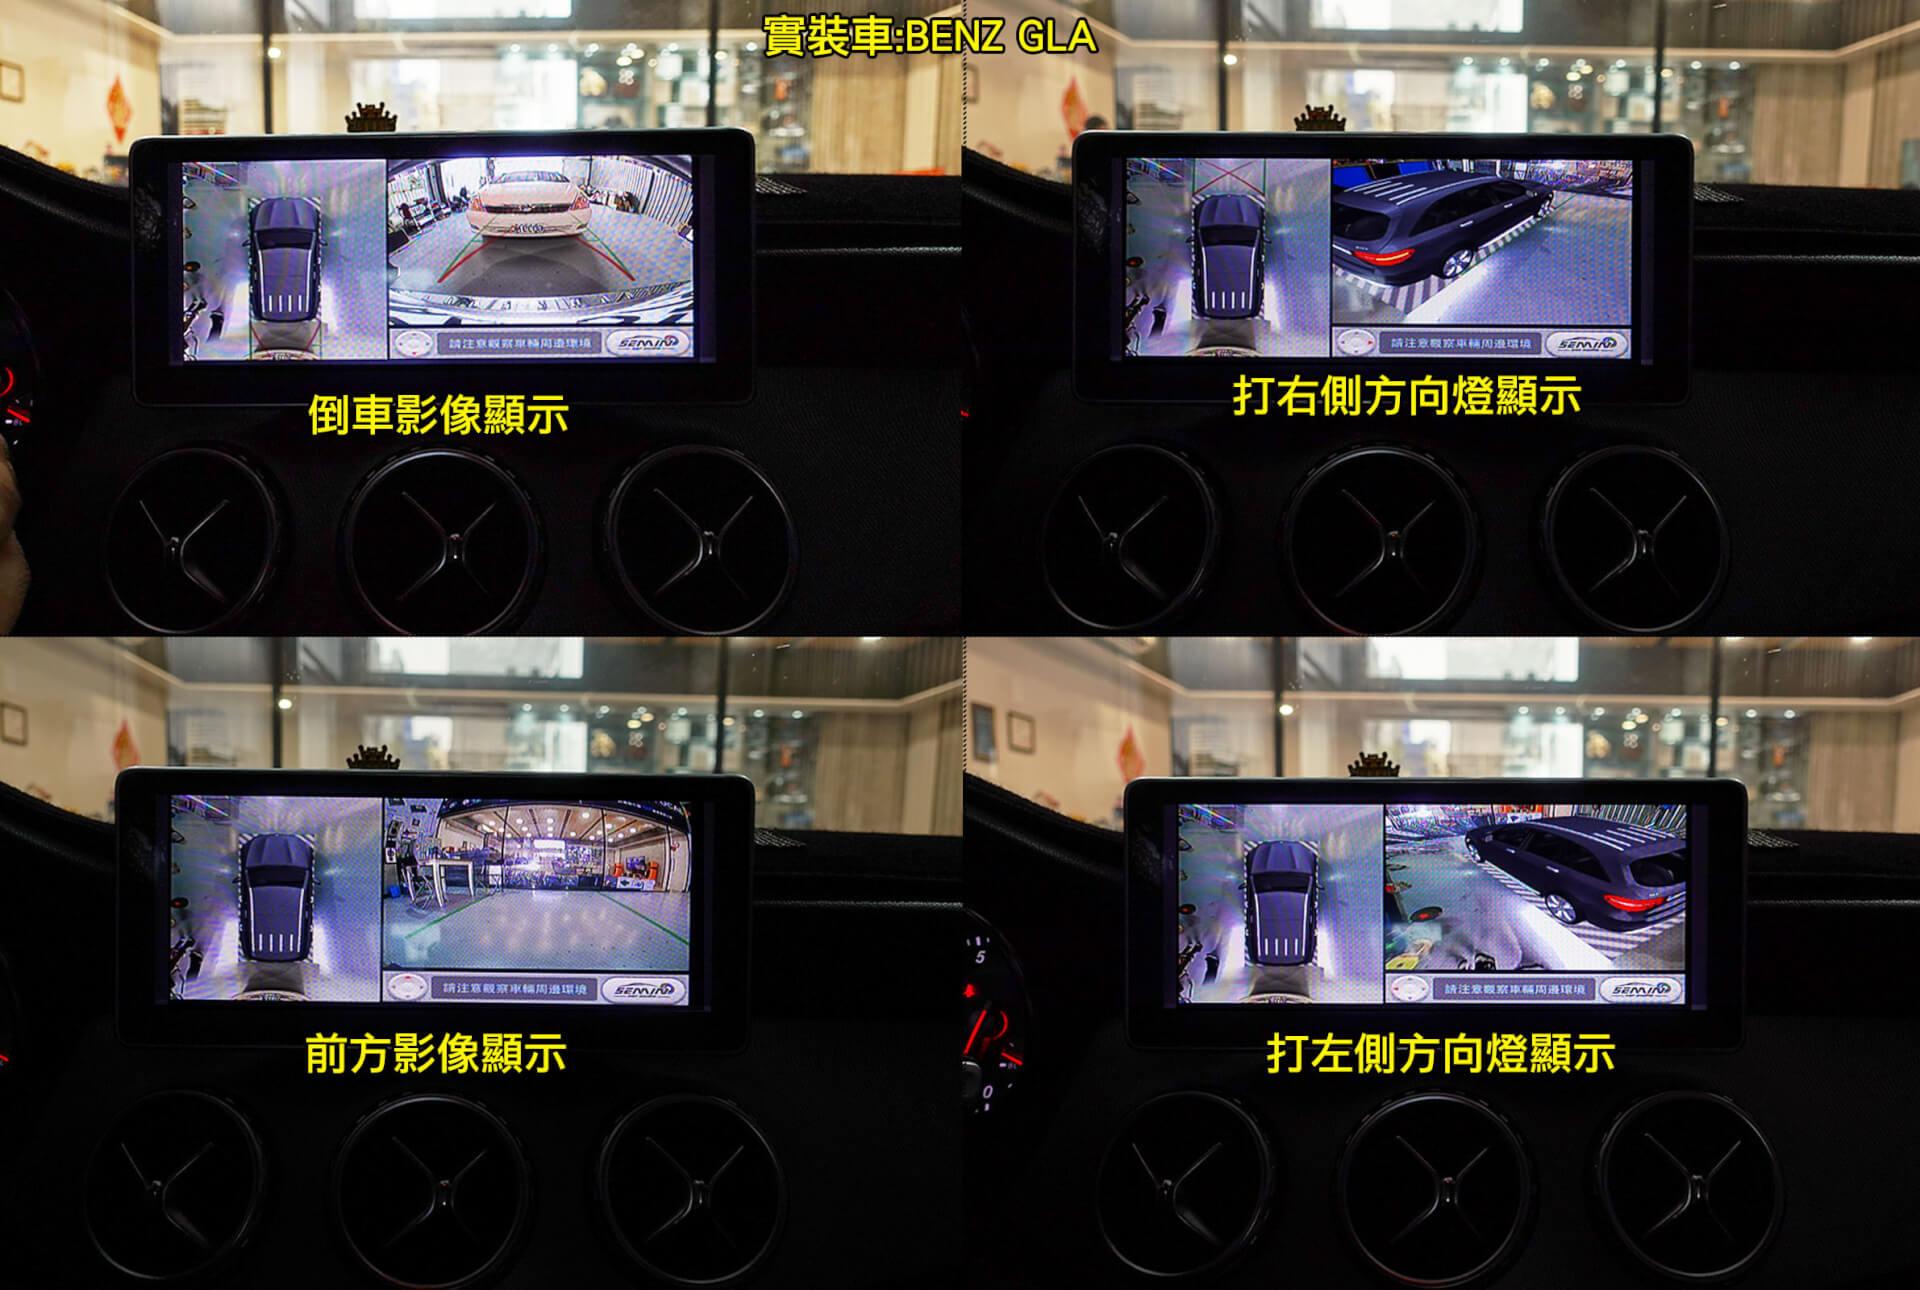 BENZ GLA 加裝360環景系統